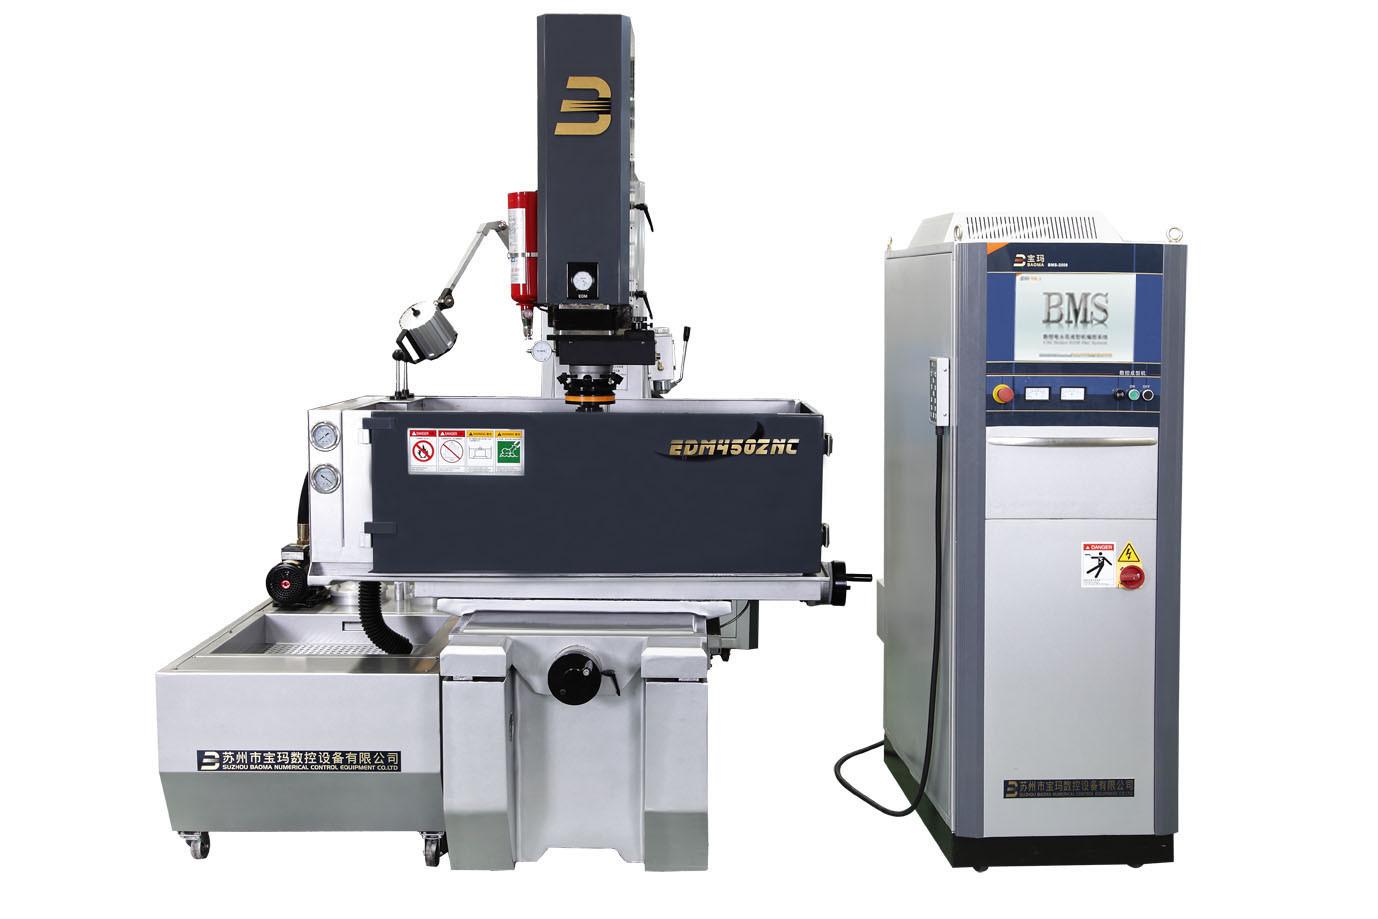 EDM450znc EDM Spark Machine EDM450znc